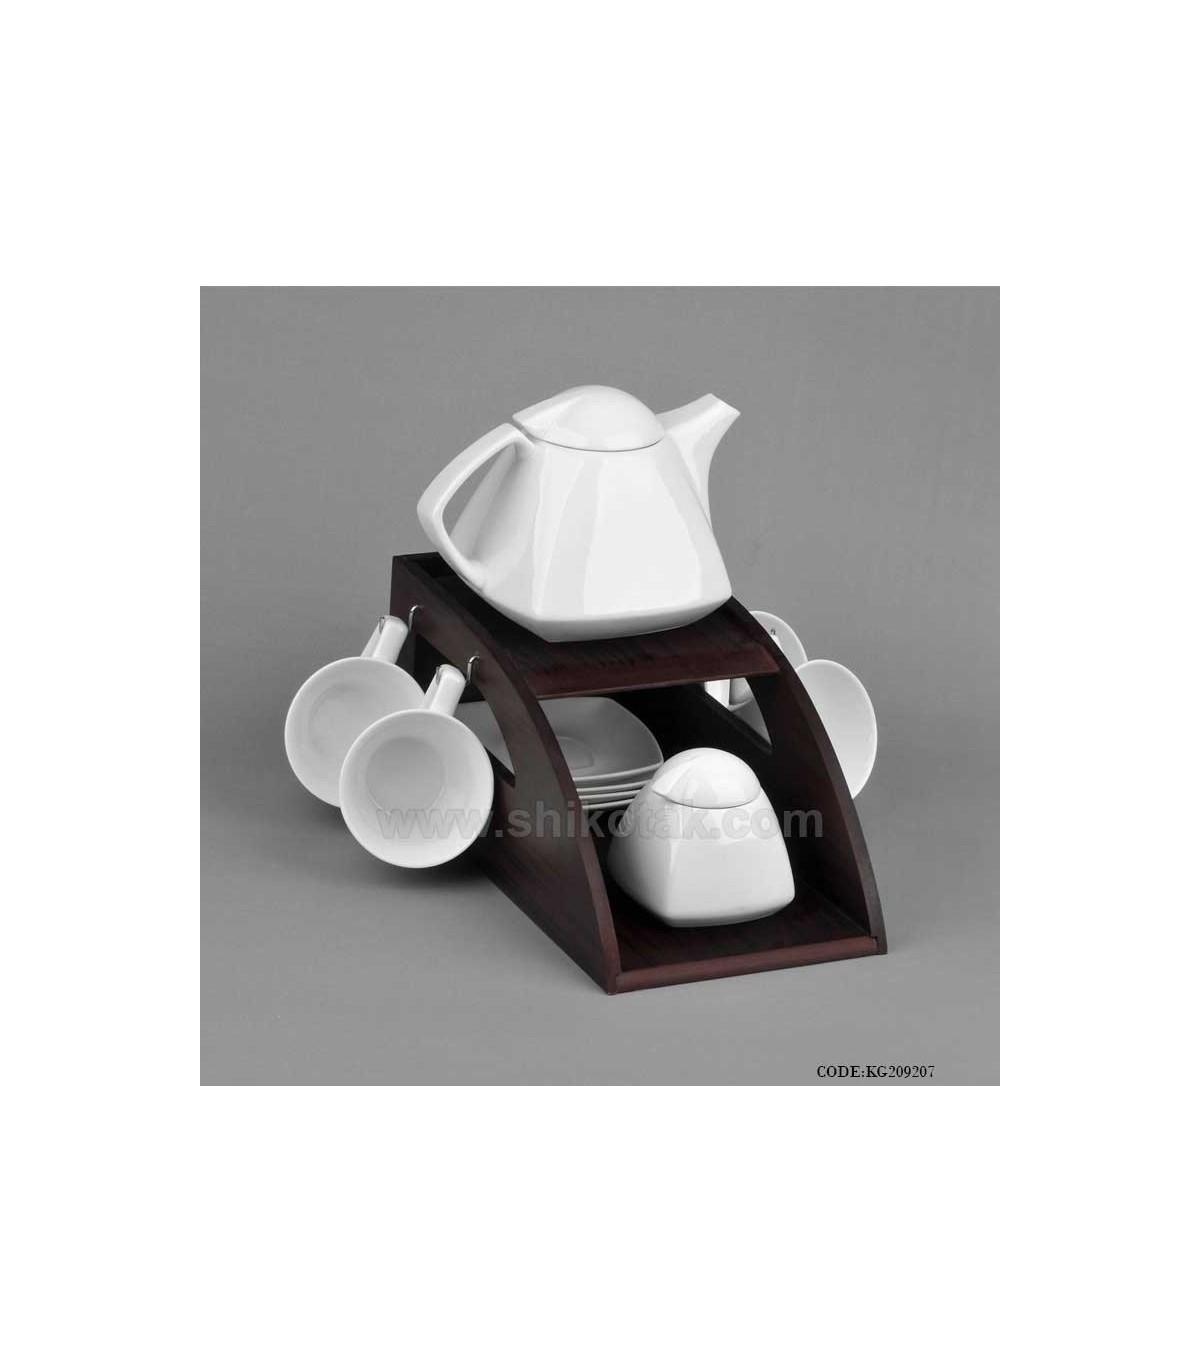 سرویس چای خوری سرامیکی هرمی